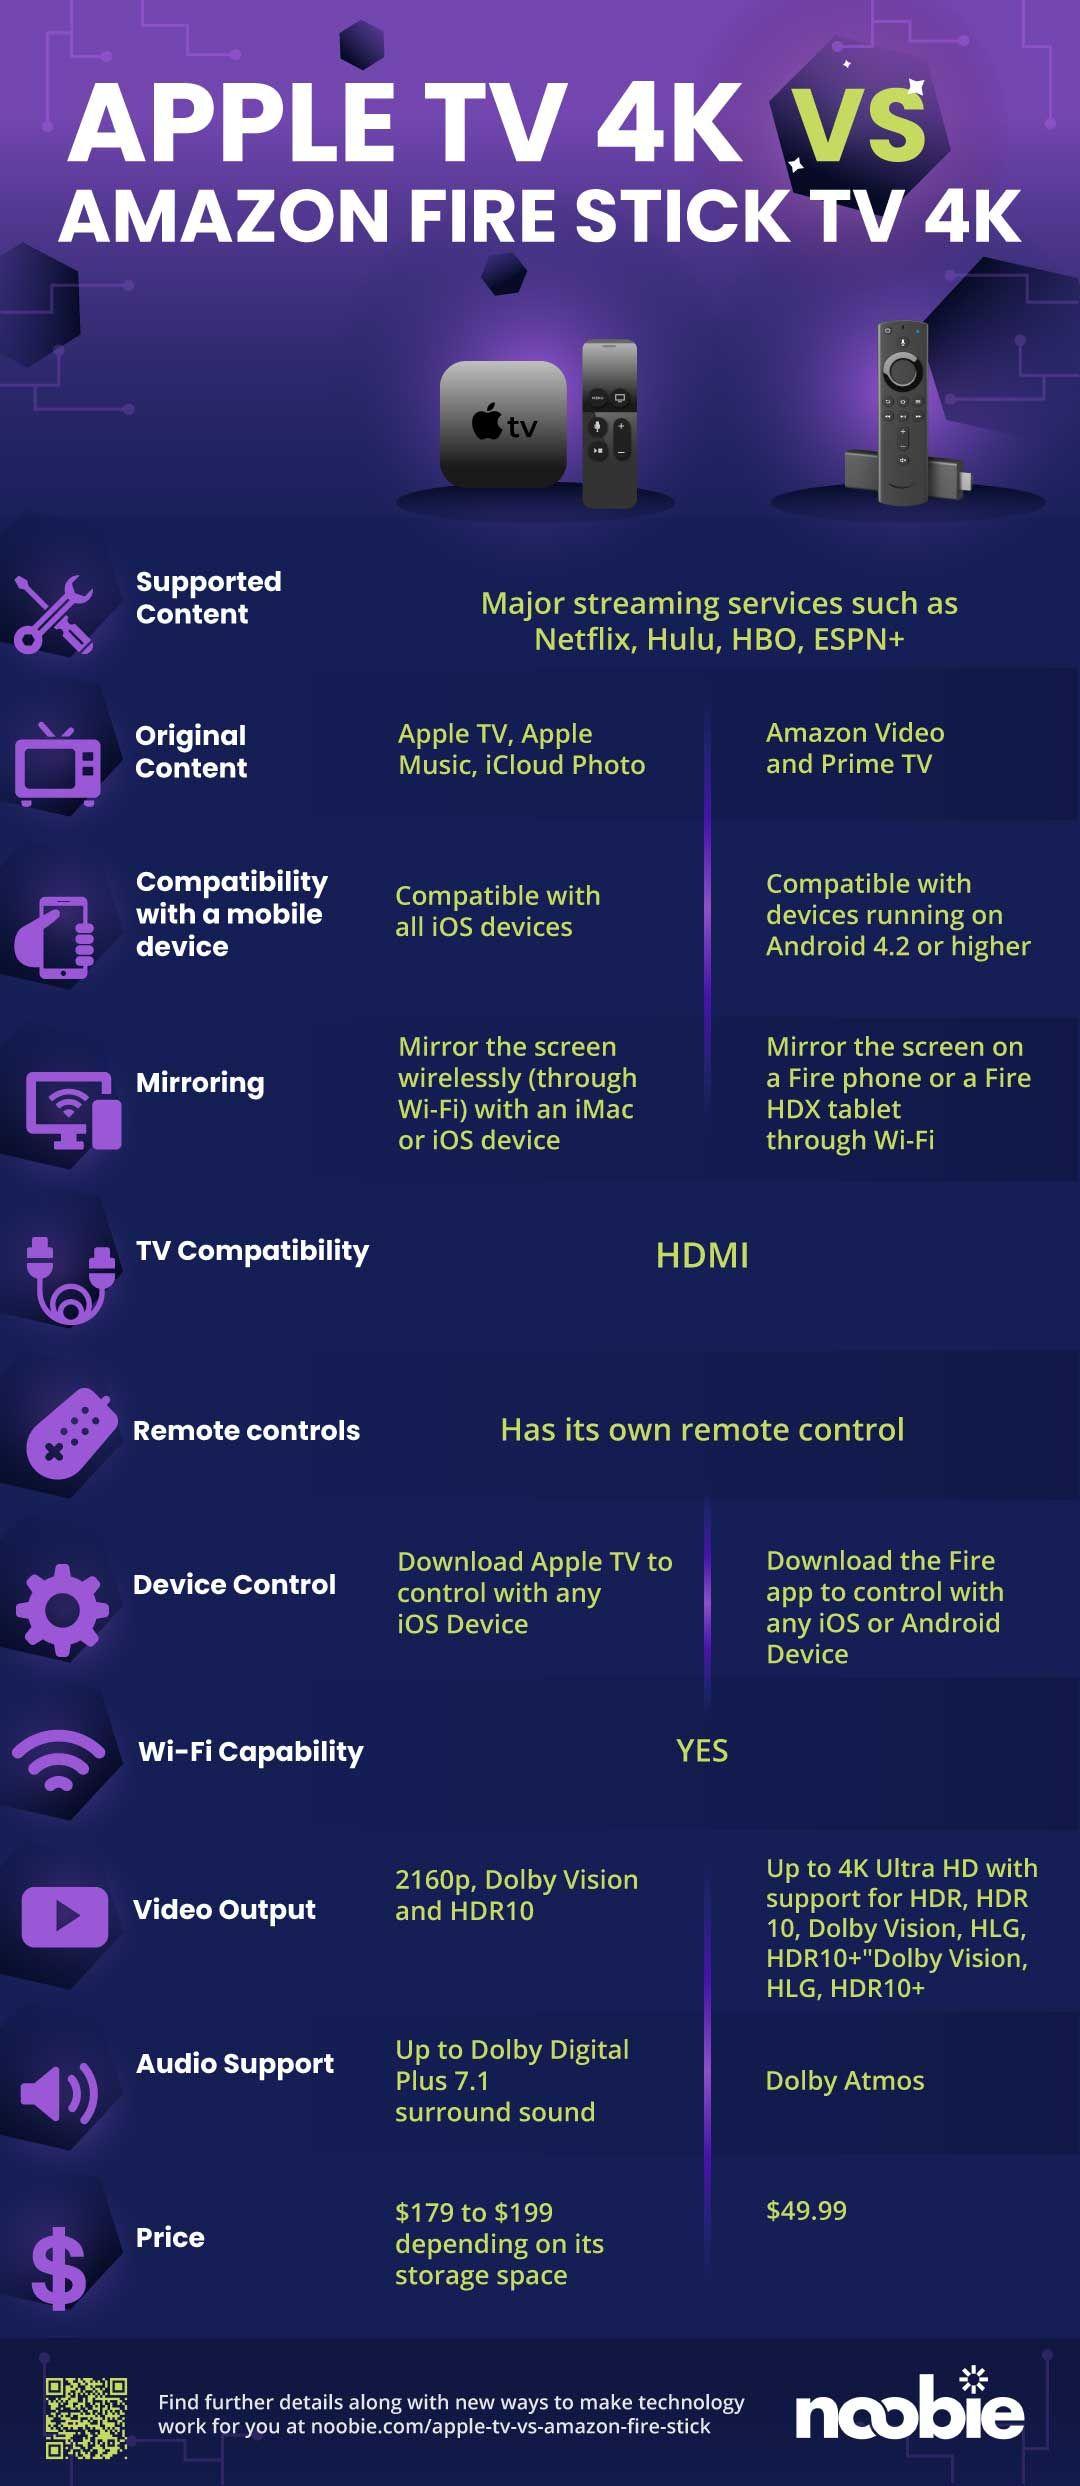 Apple TV vs Amazon Fire Stick Duel Revealed [INFOGRAPHIC